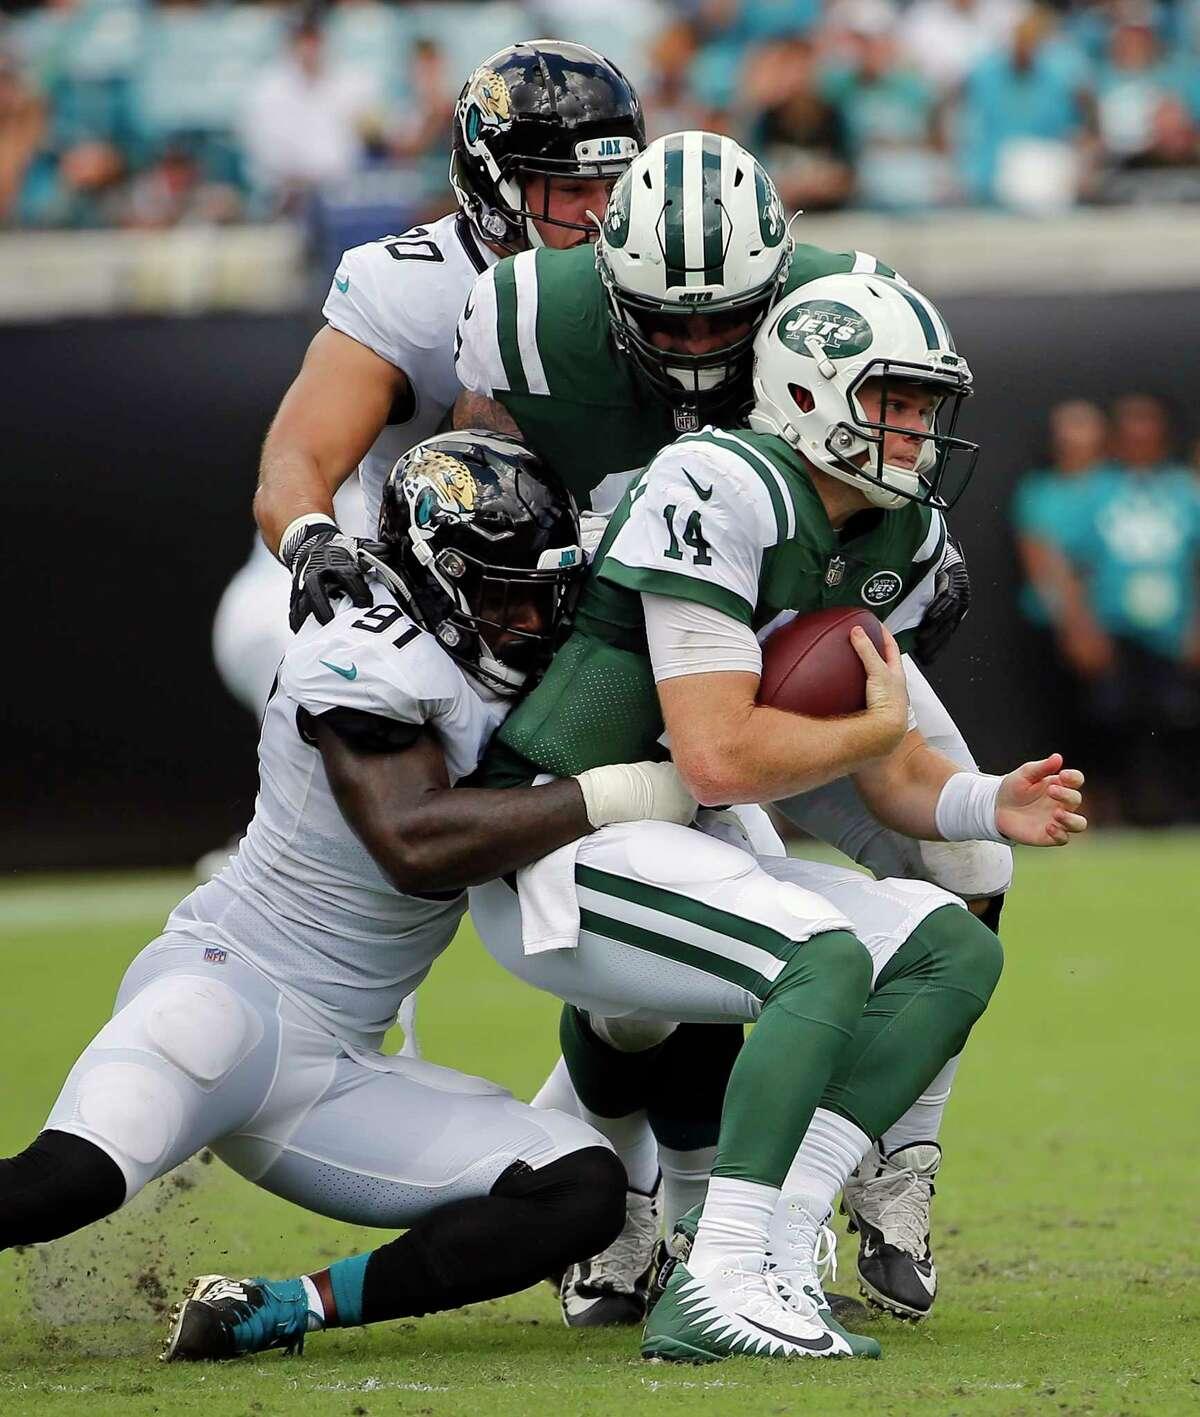 Jacksonville Jaguars defensive end Yannick Ngakoue, lower left, sacks New York Jets quarterback Sam Darnold (14) during the first half of an NFL football game, Sunday, Sept. 30, 2018, in Jacksonville, Fla. (AP Photo/Stephen B. Morton)